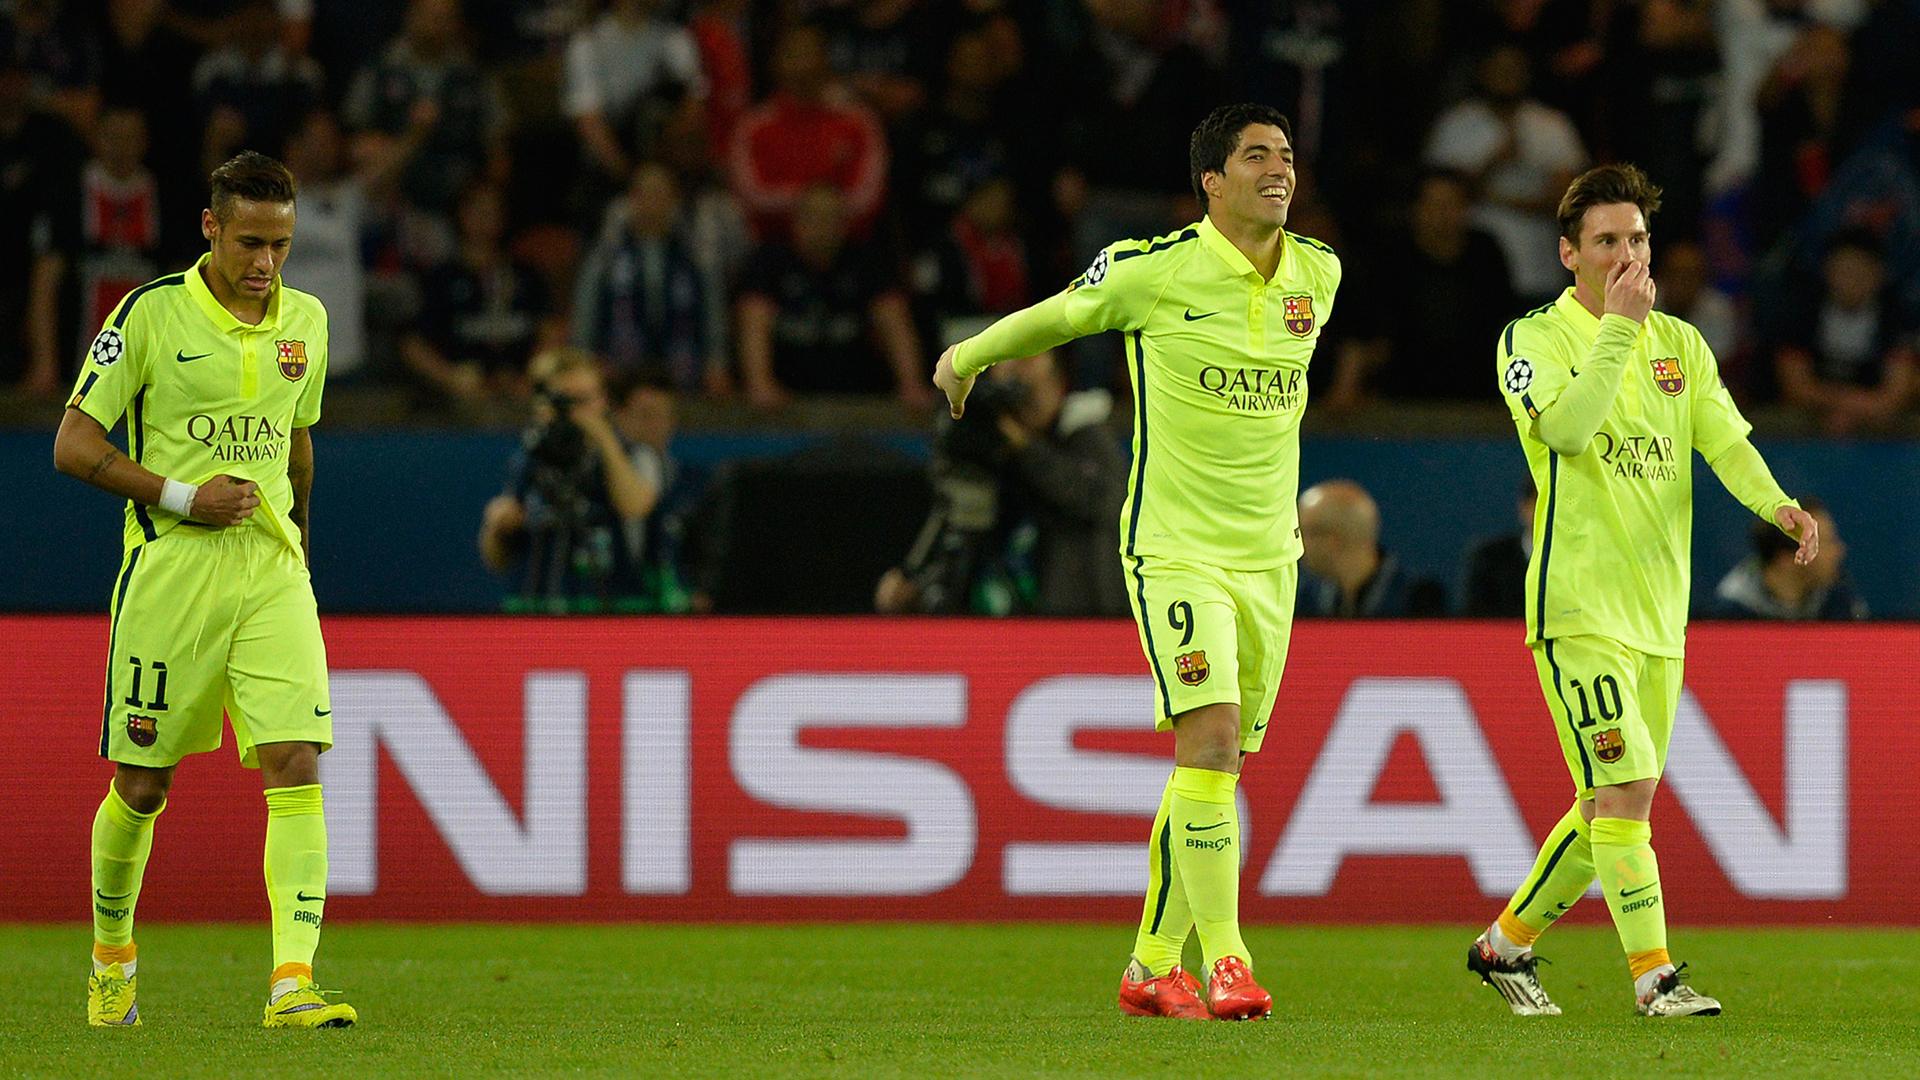 Messi Suarez Neymar Barcelona Paris Saint-Germain